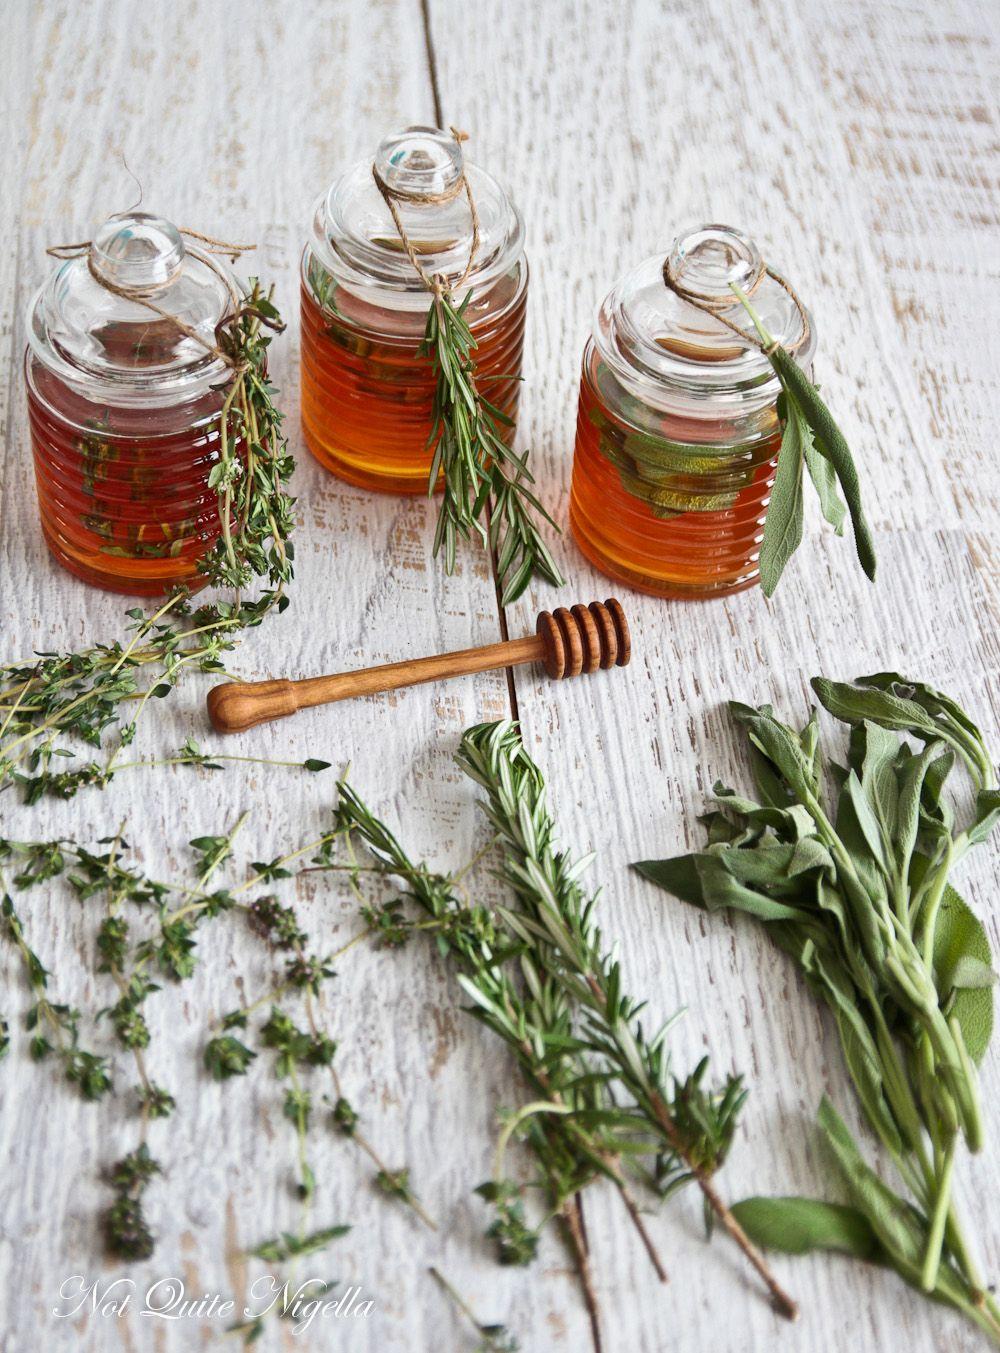 Rosemary, Lemon Thyme & Sage Honeys